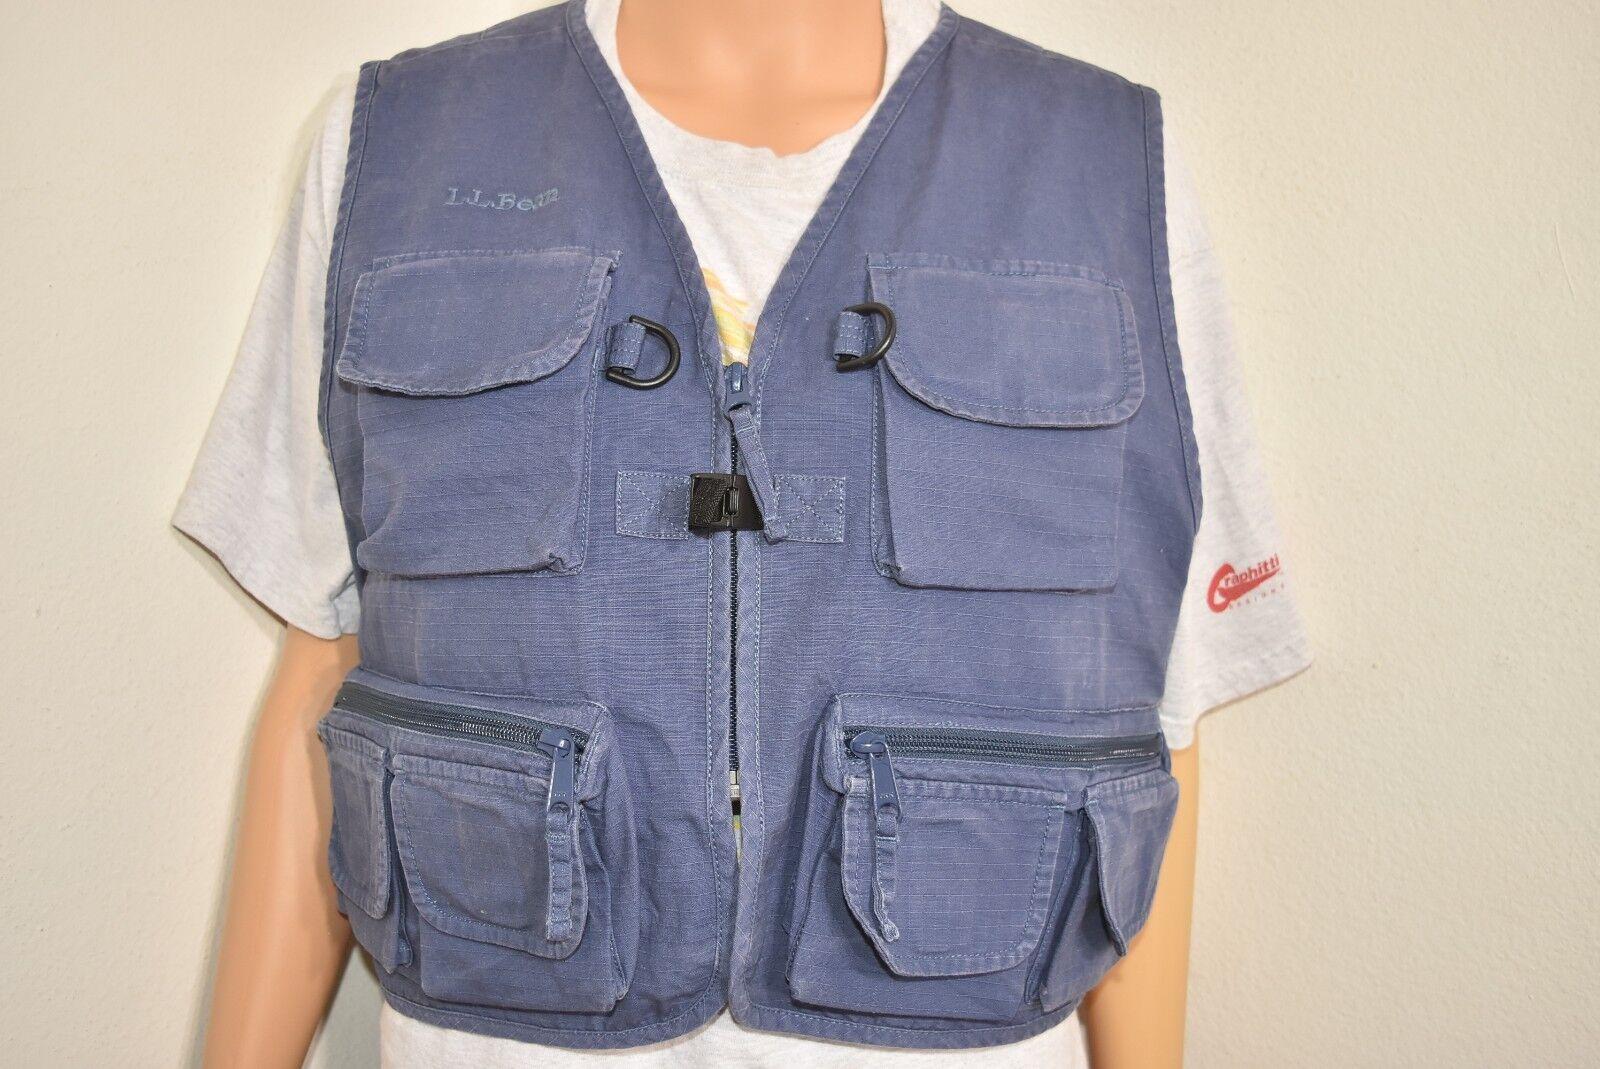 LL Bean Womens Hunting Fishing Vest bluee Cotton Photography vest vest vest Size Small e0d722